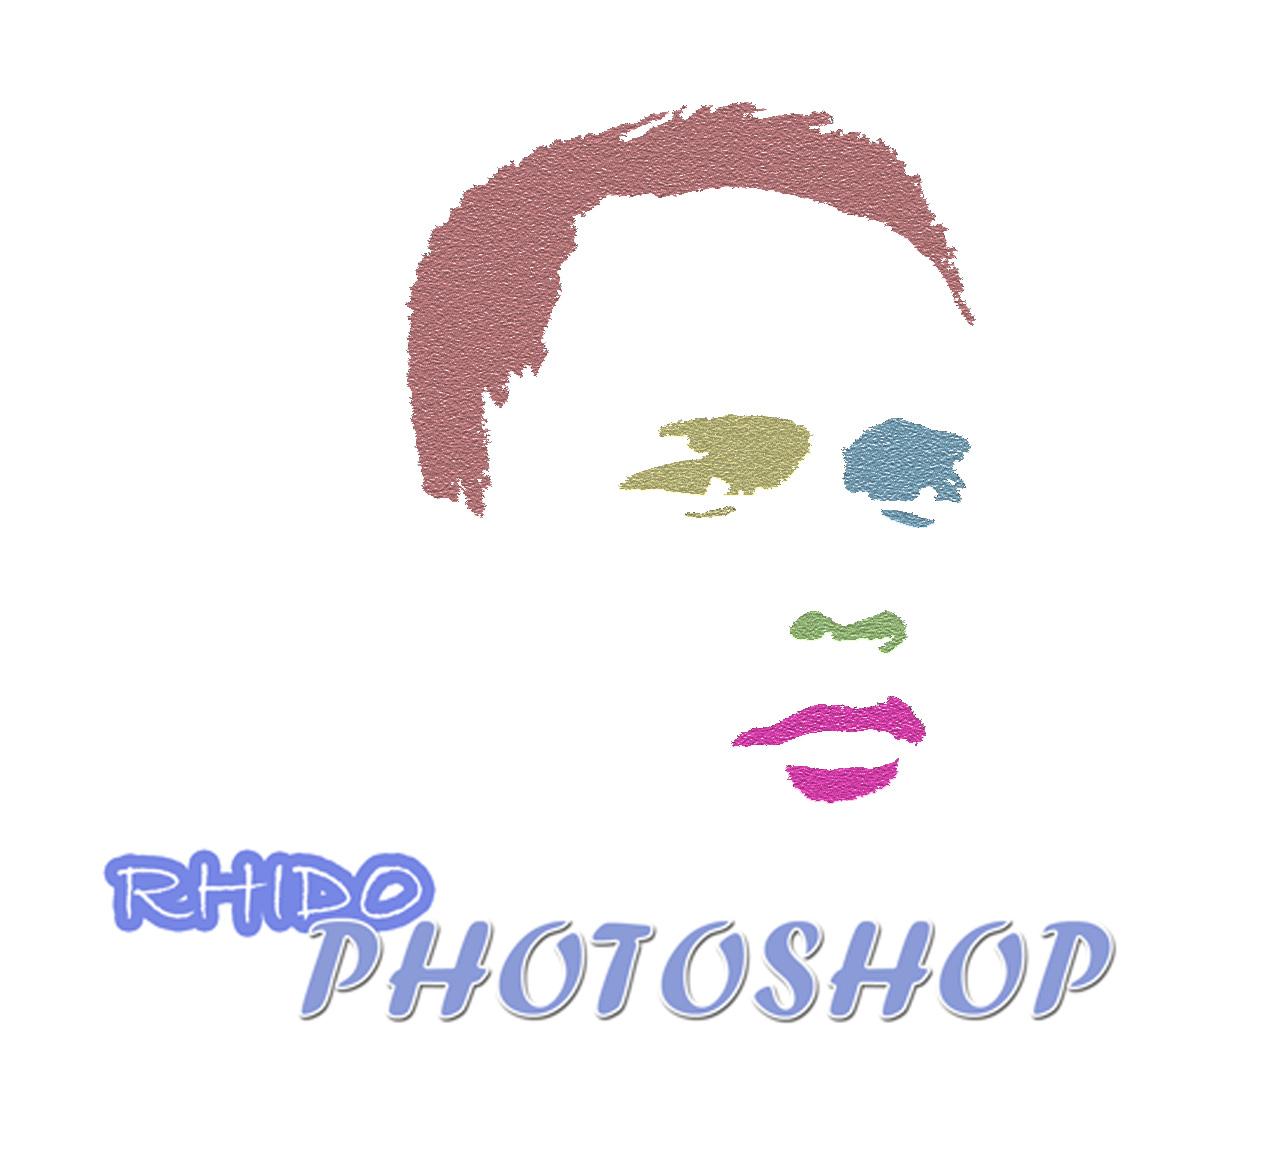 Download image Desain Multimedia Sketsa Wajah Paper PC, Android ...